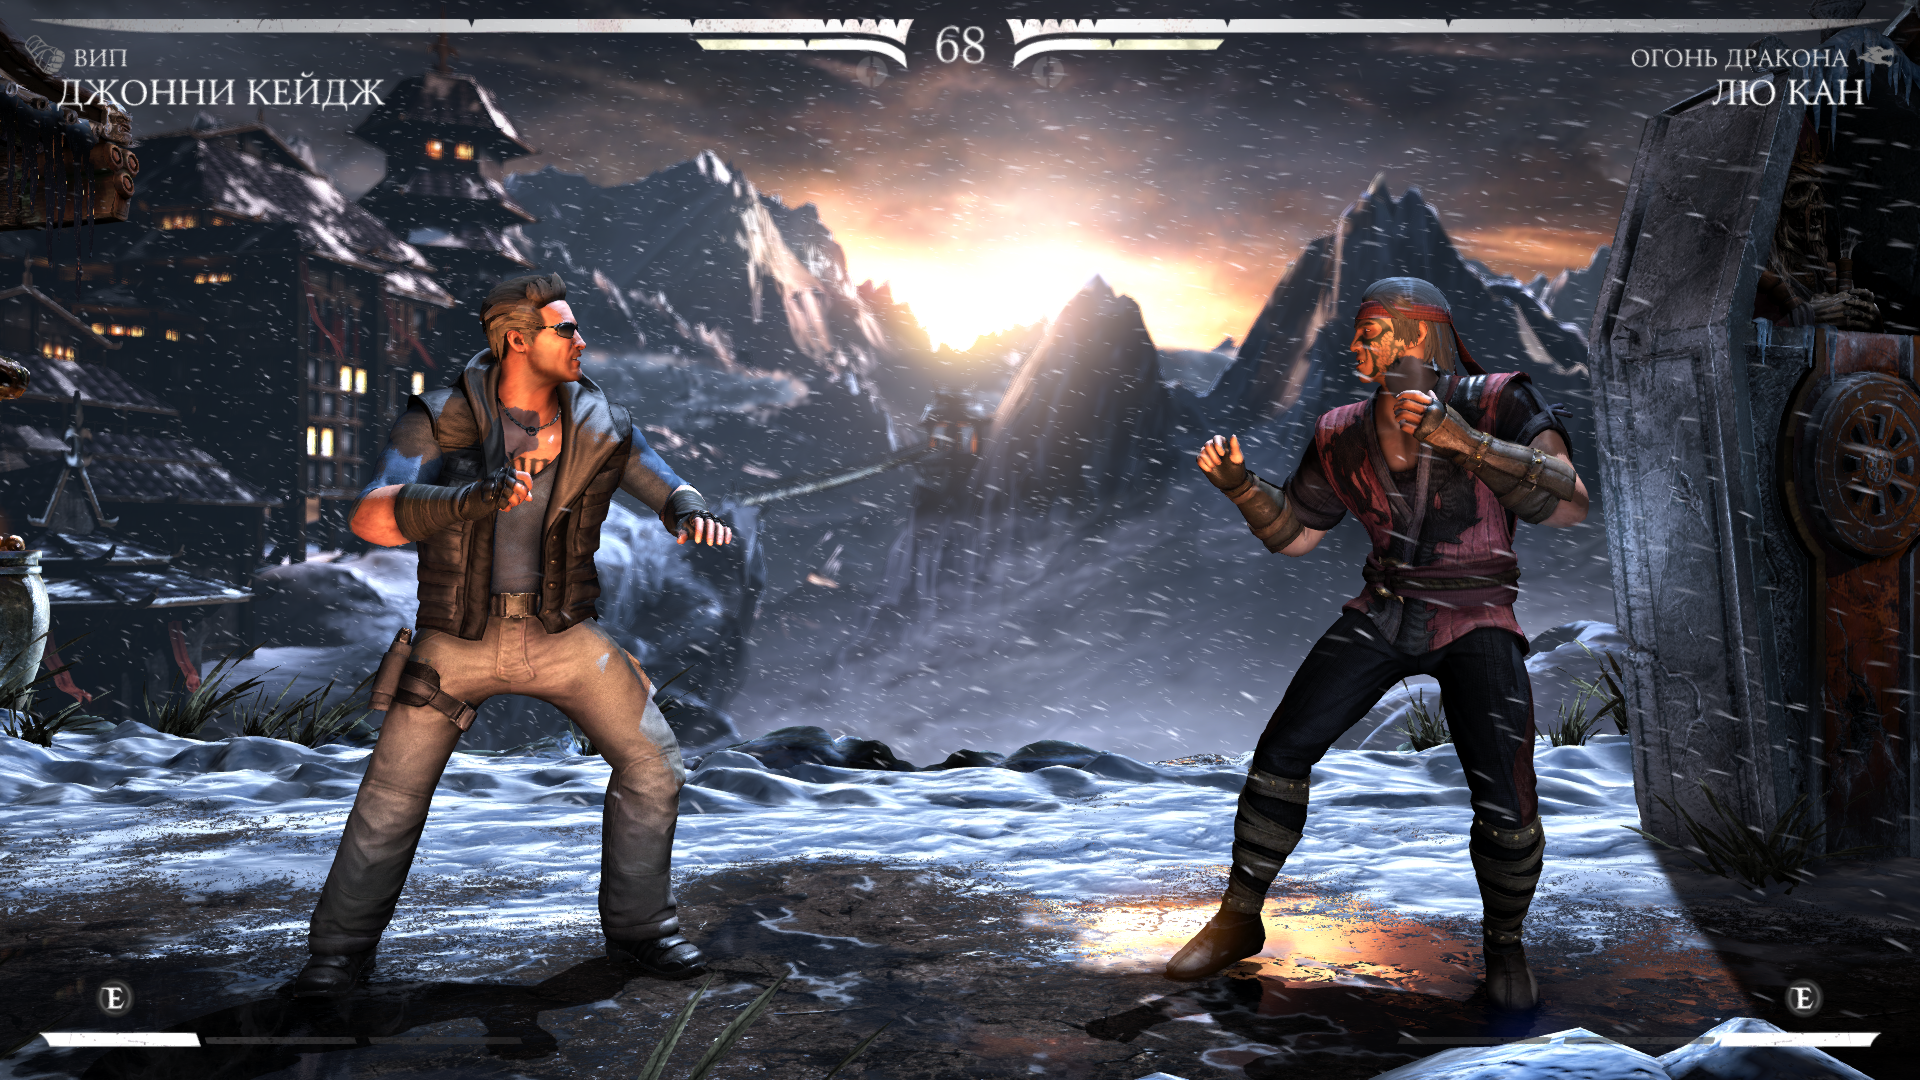 Mortal Kombat 11 - Screenshot-Galerie | pressakey.com